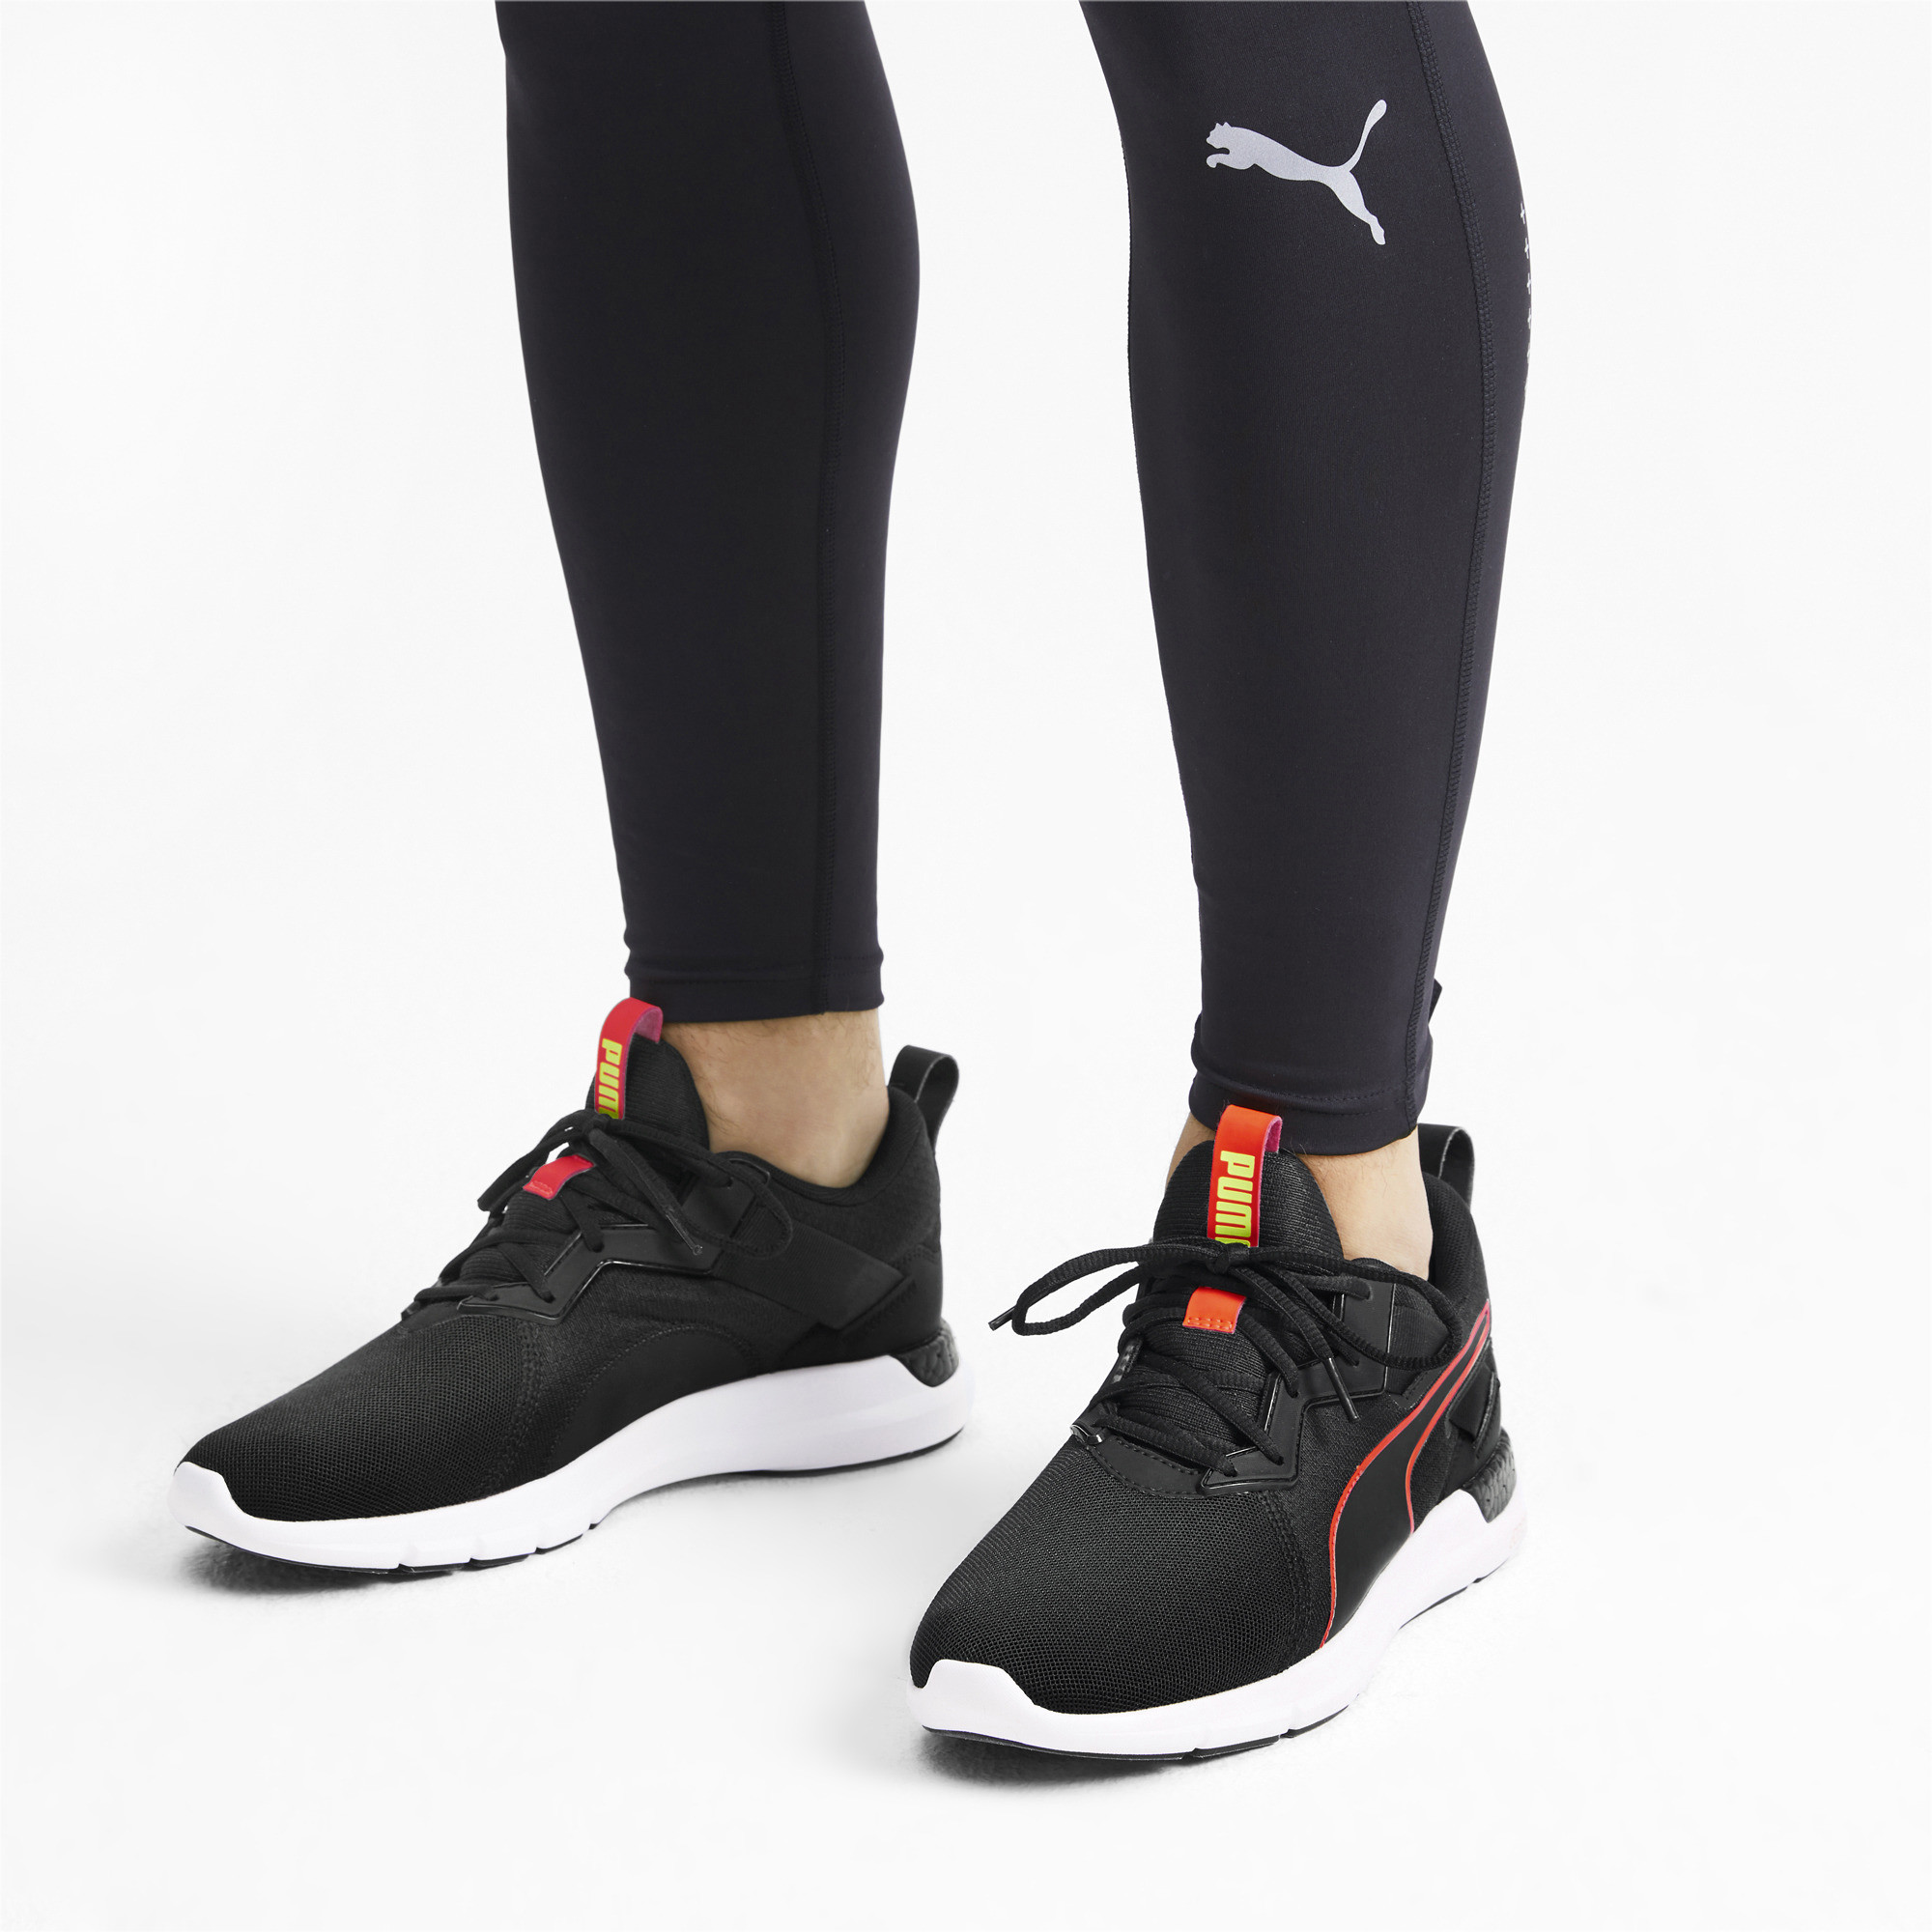 PUMA-NRGY-Dynamo-Futuro-Men-039-s-Running-Shoes-Men-Shoe-Running thumbnail 12